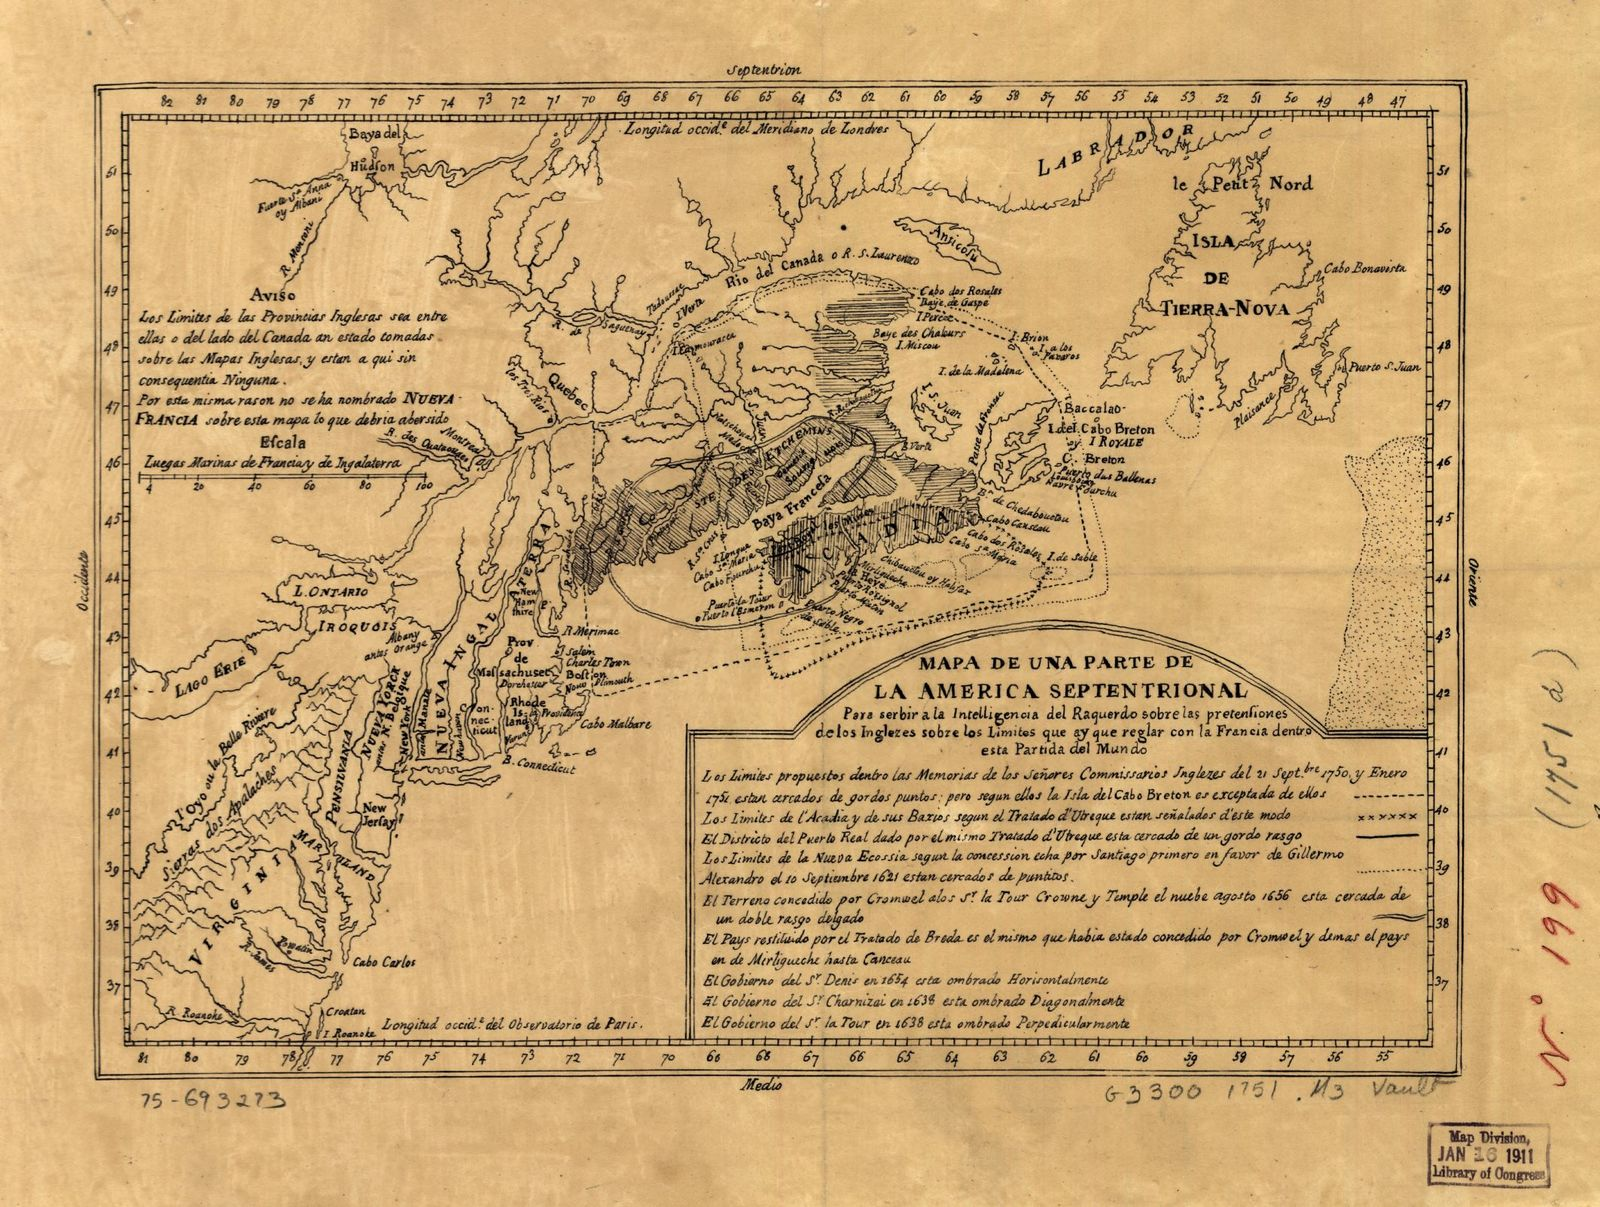 Mapa de una parte de la America Septentrional